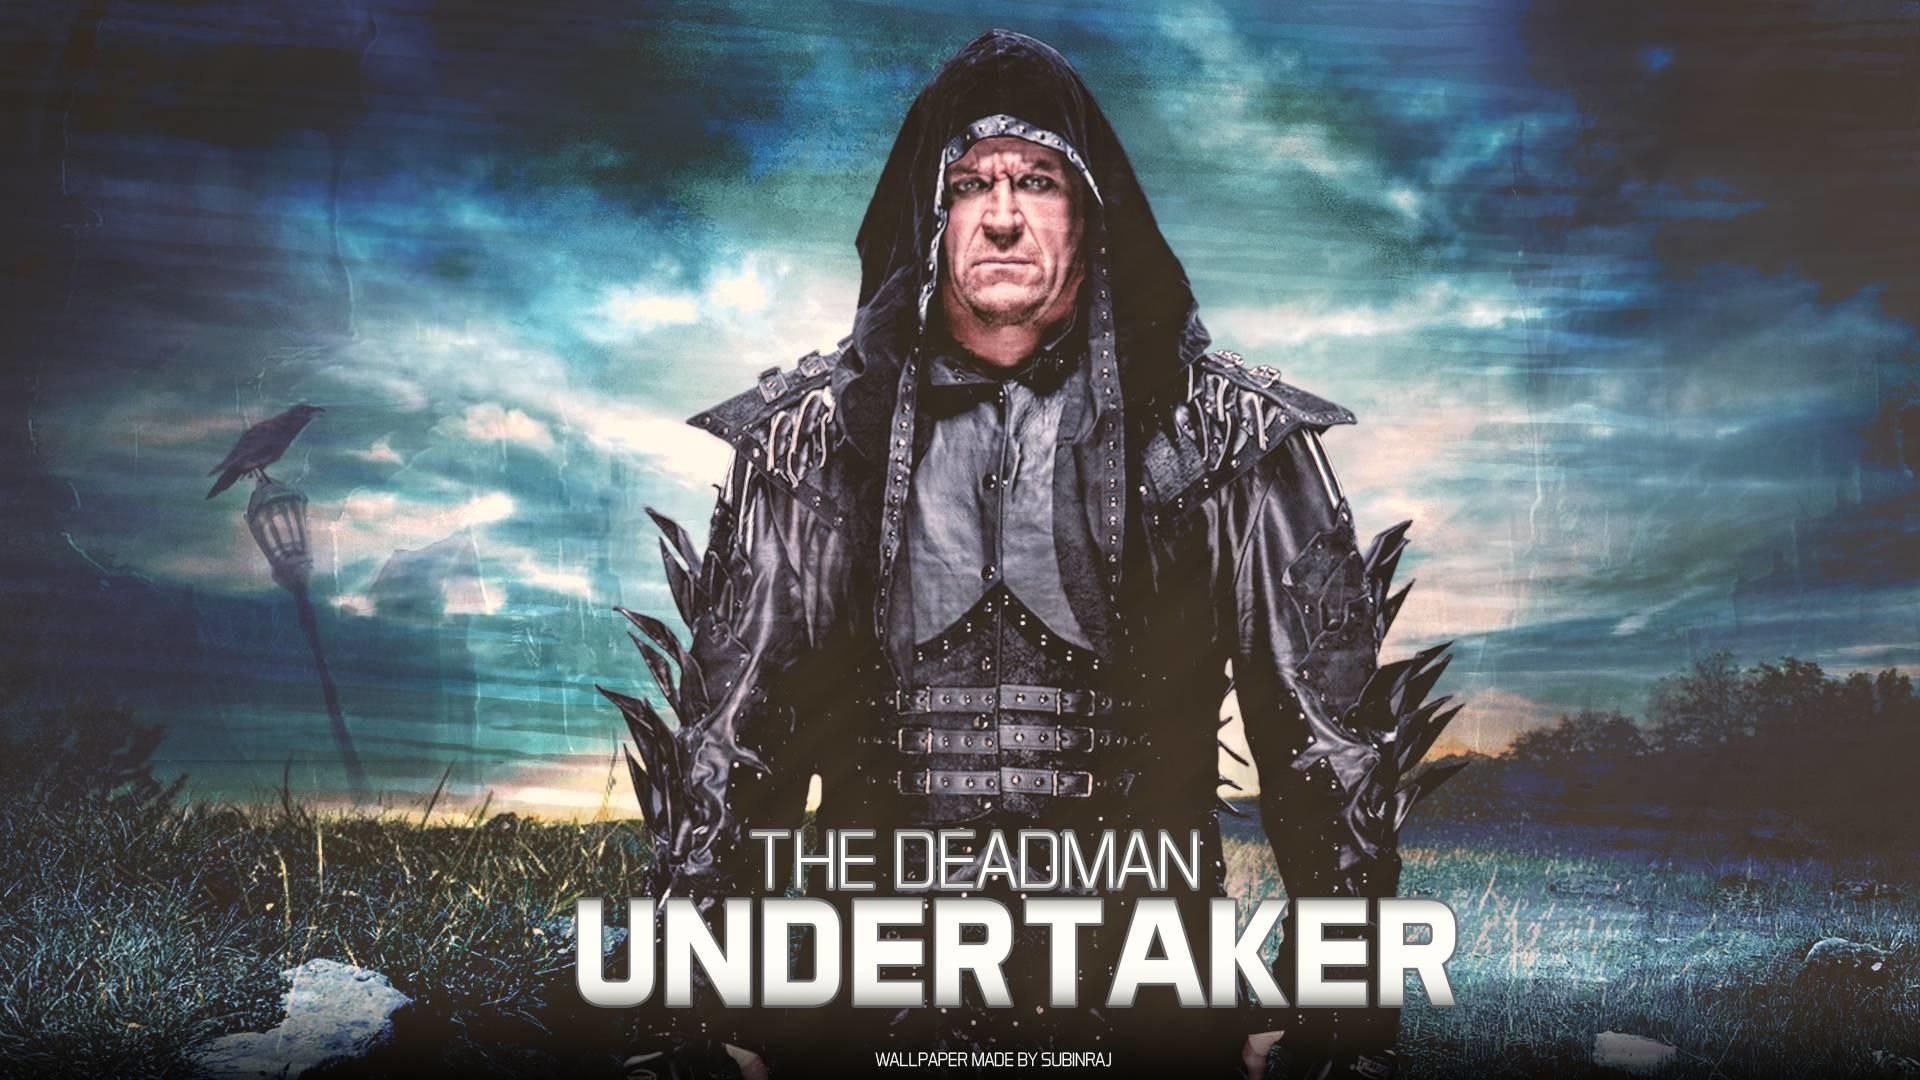 The Undertaker Wallpaper 2018 ①